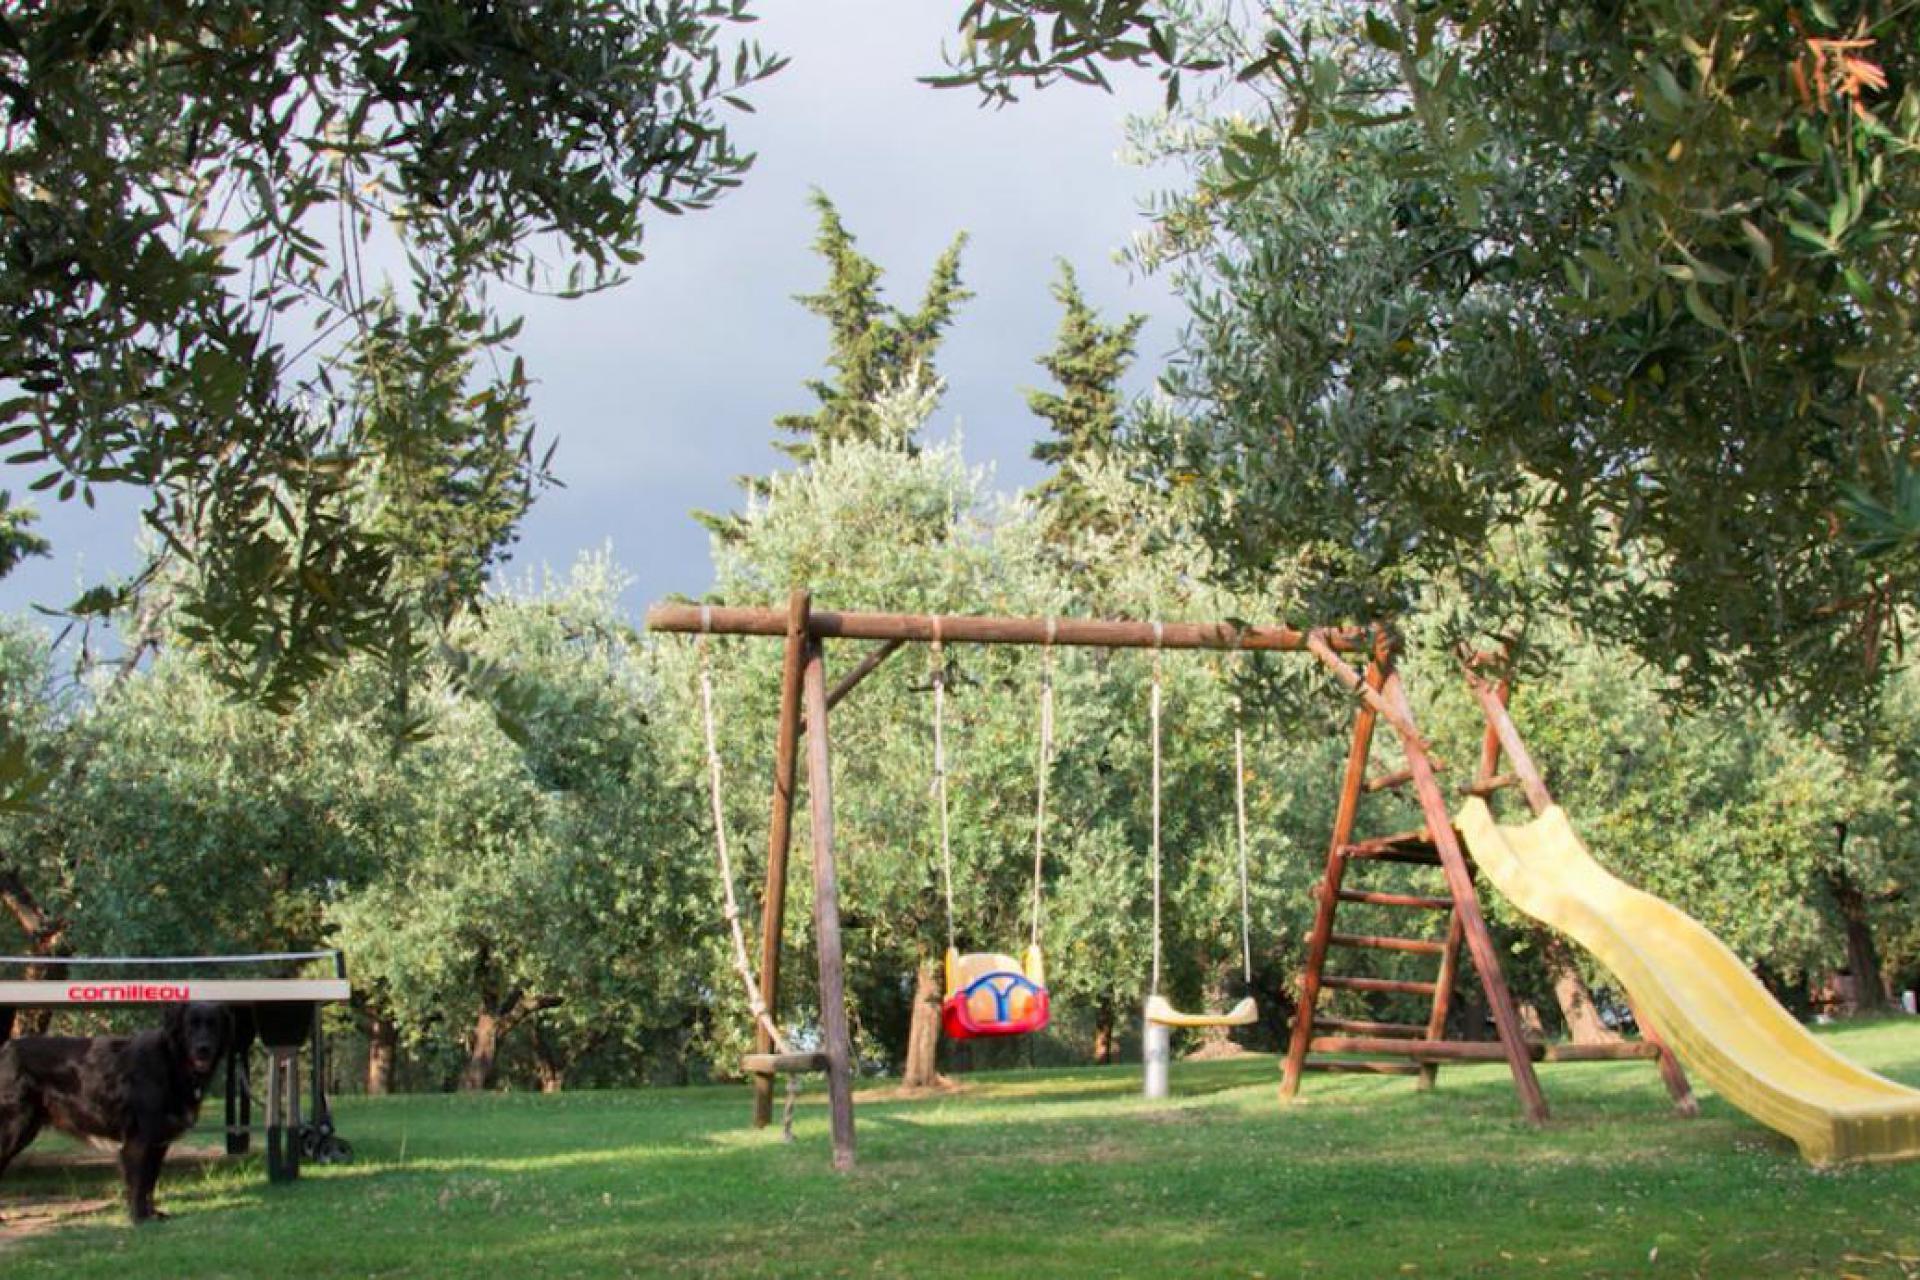 Agriturismo Toscane Prachtige, kindvriendelijke agriturismo bij Lucca | myitaly.nl